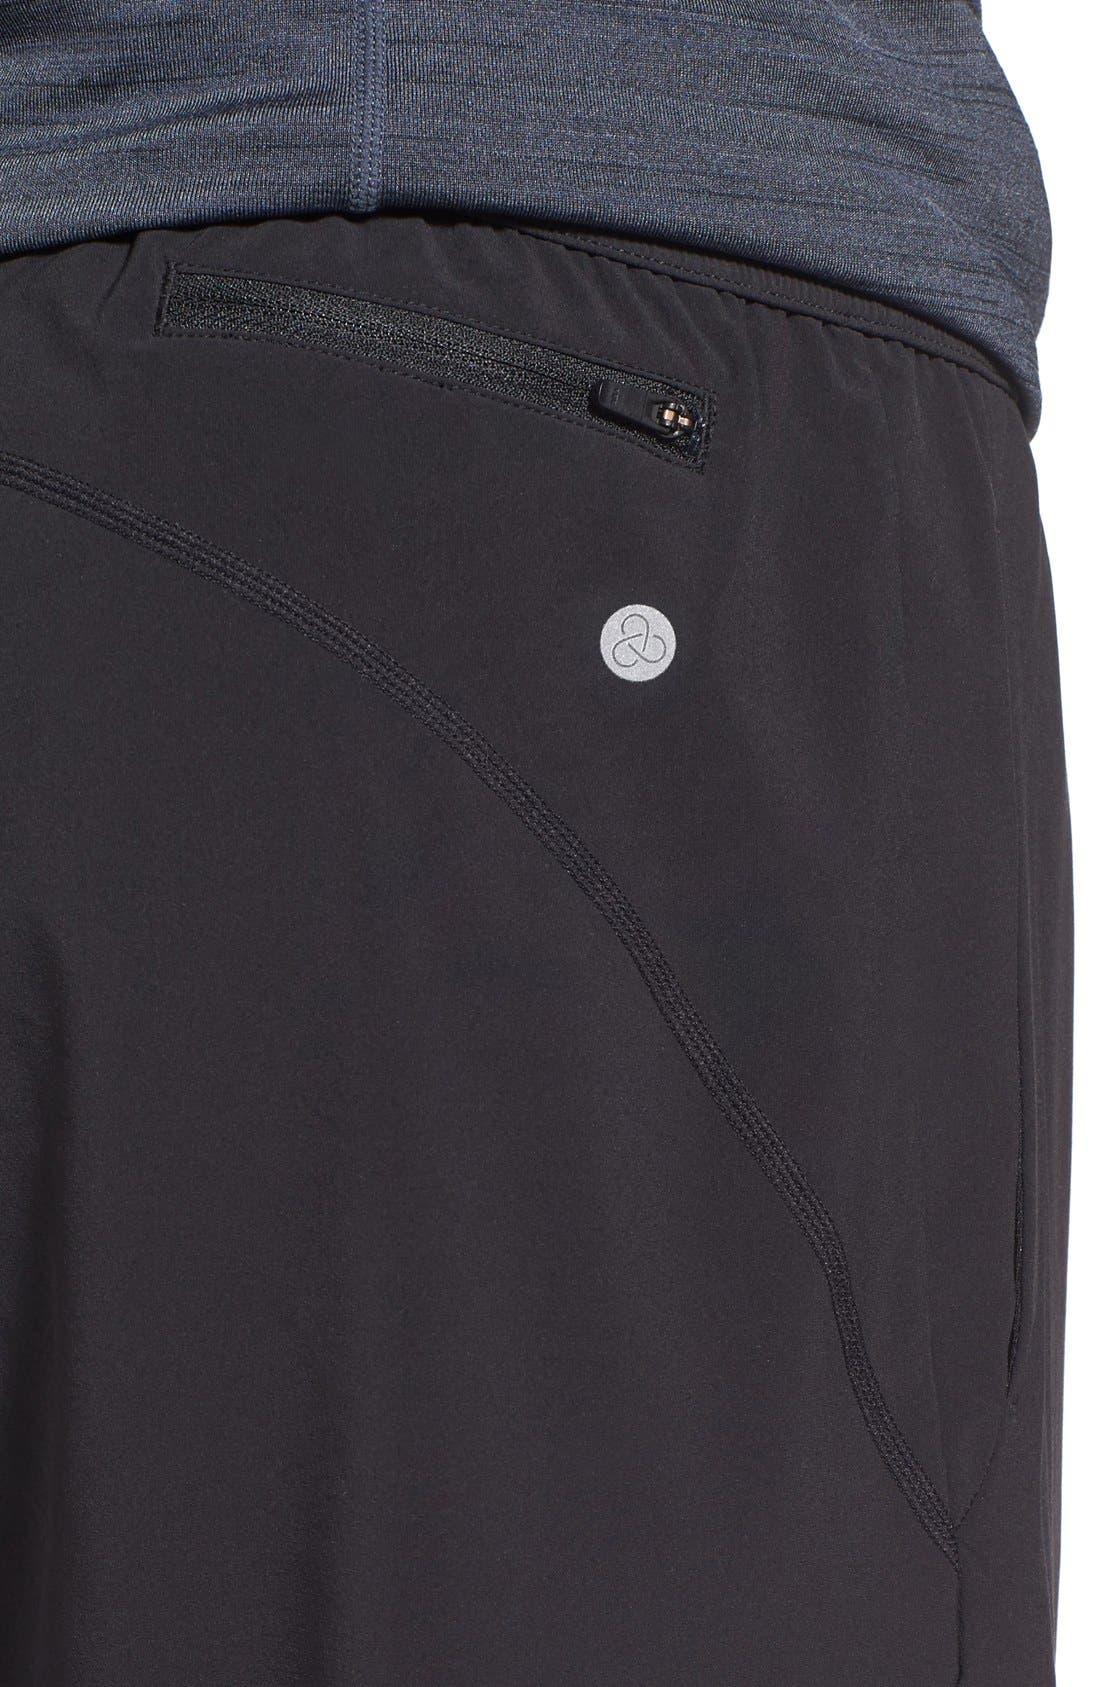 Alternate Image 4  - Zella 'Graphite' Tapered Athletic Pants